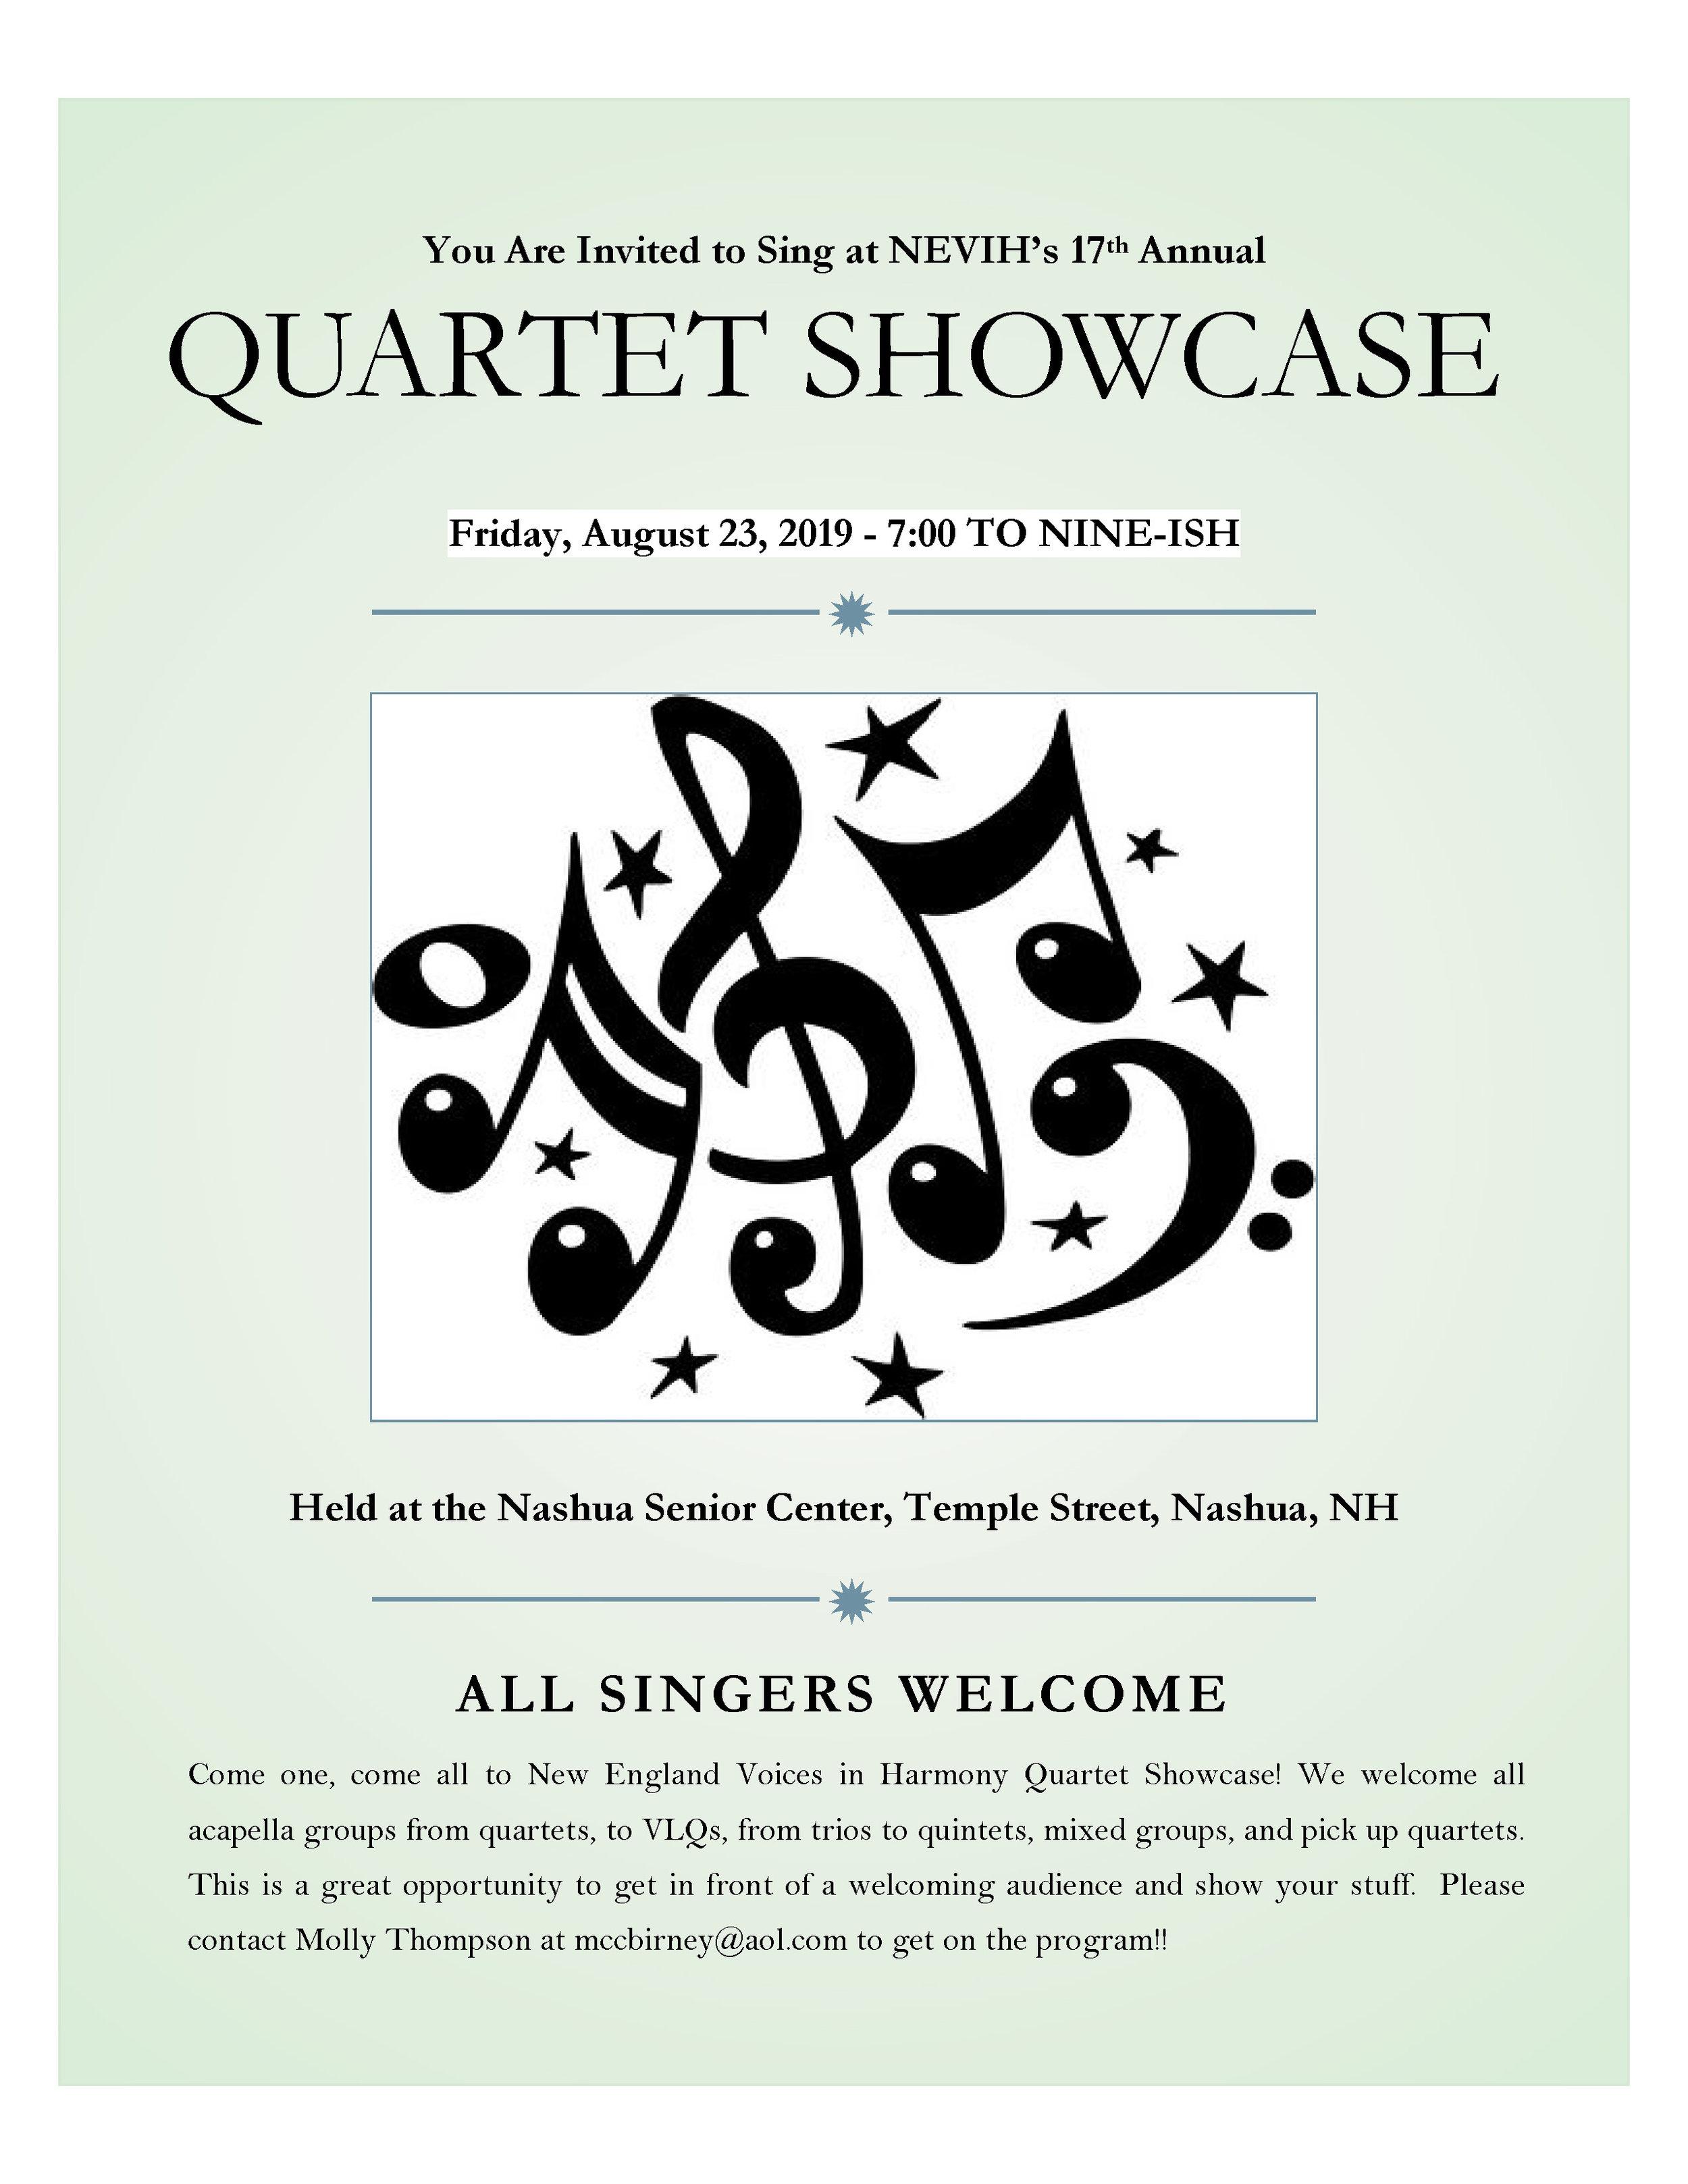 NEVIH's Quartet Showcase.jpg